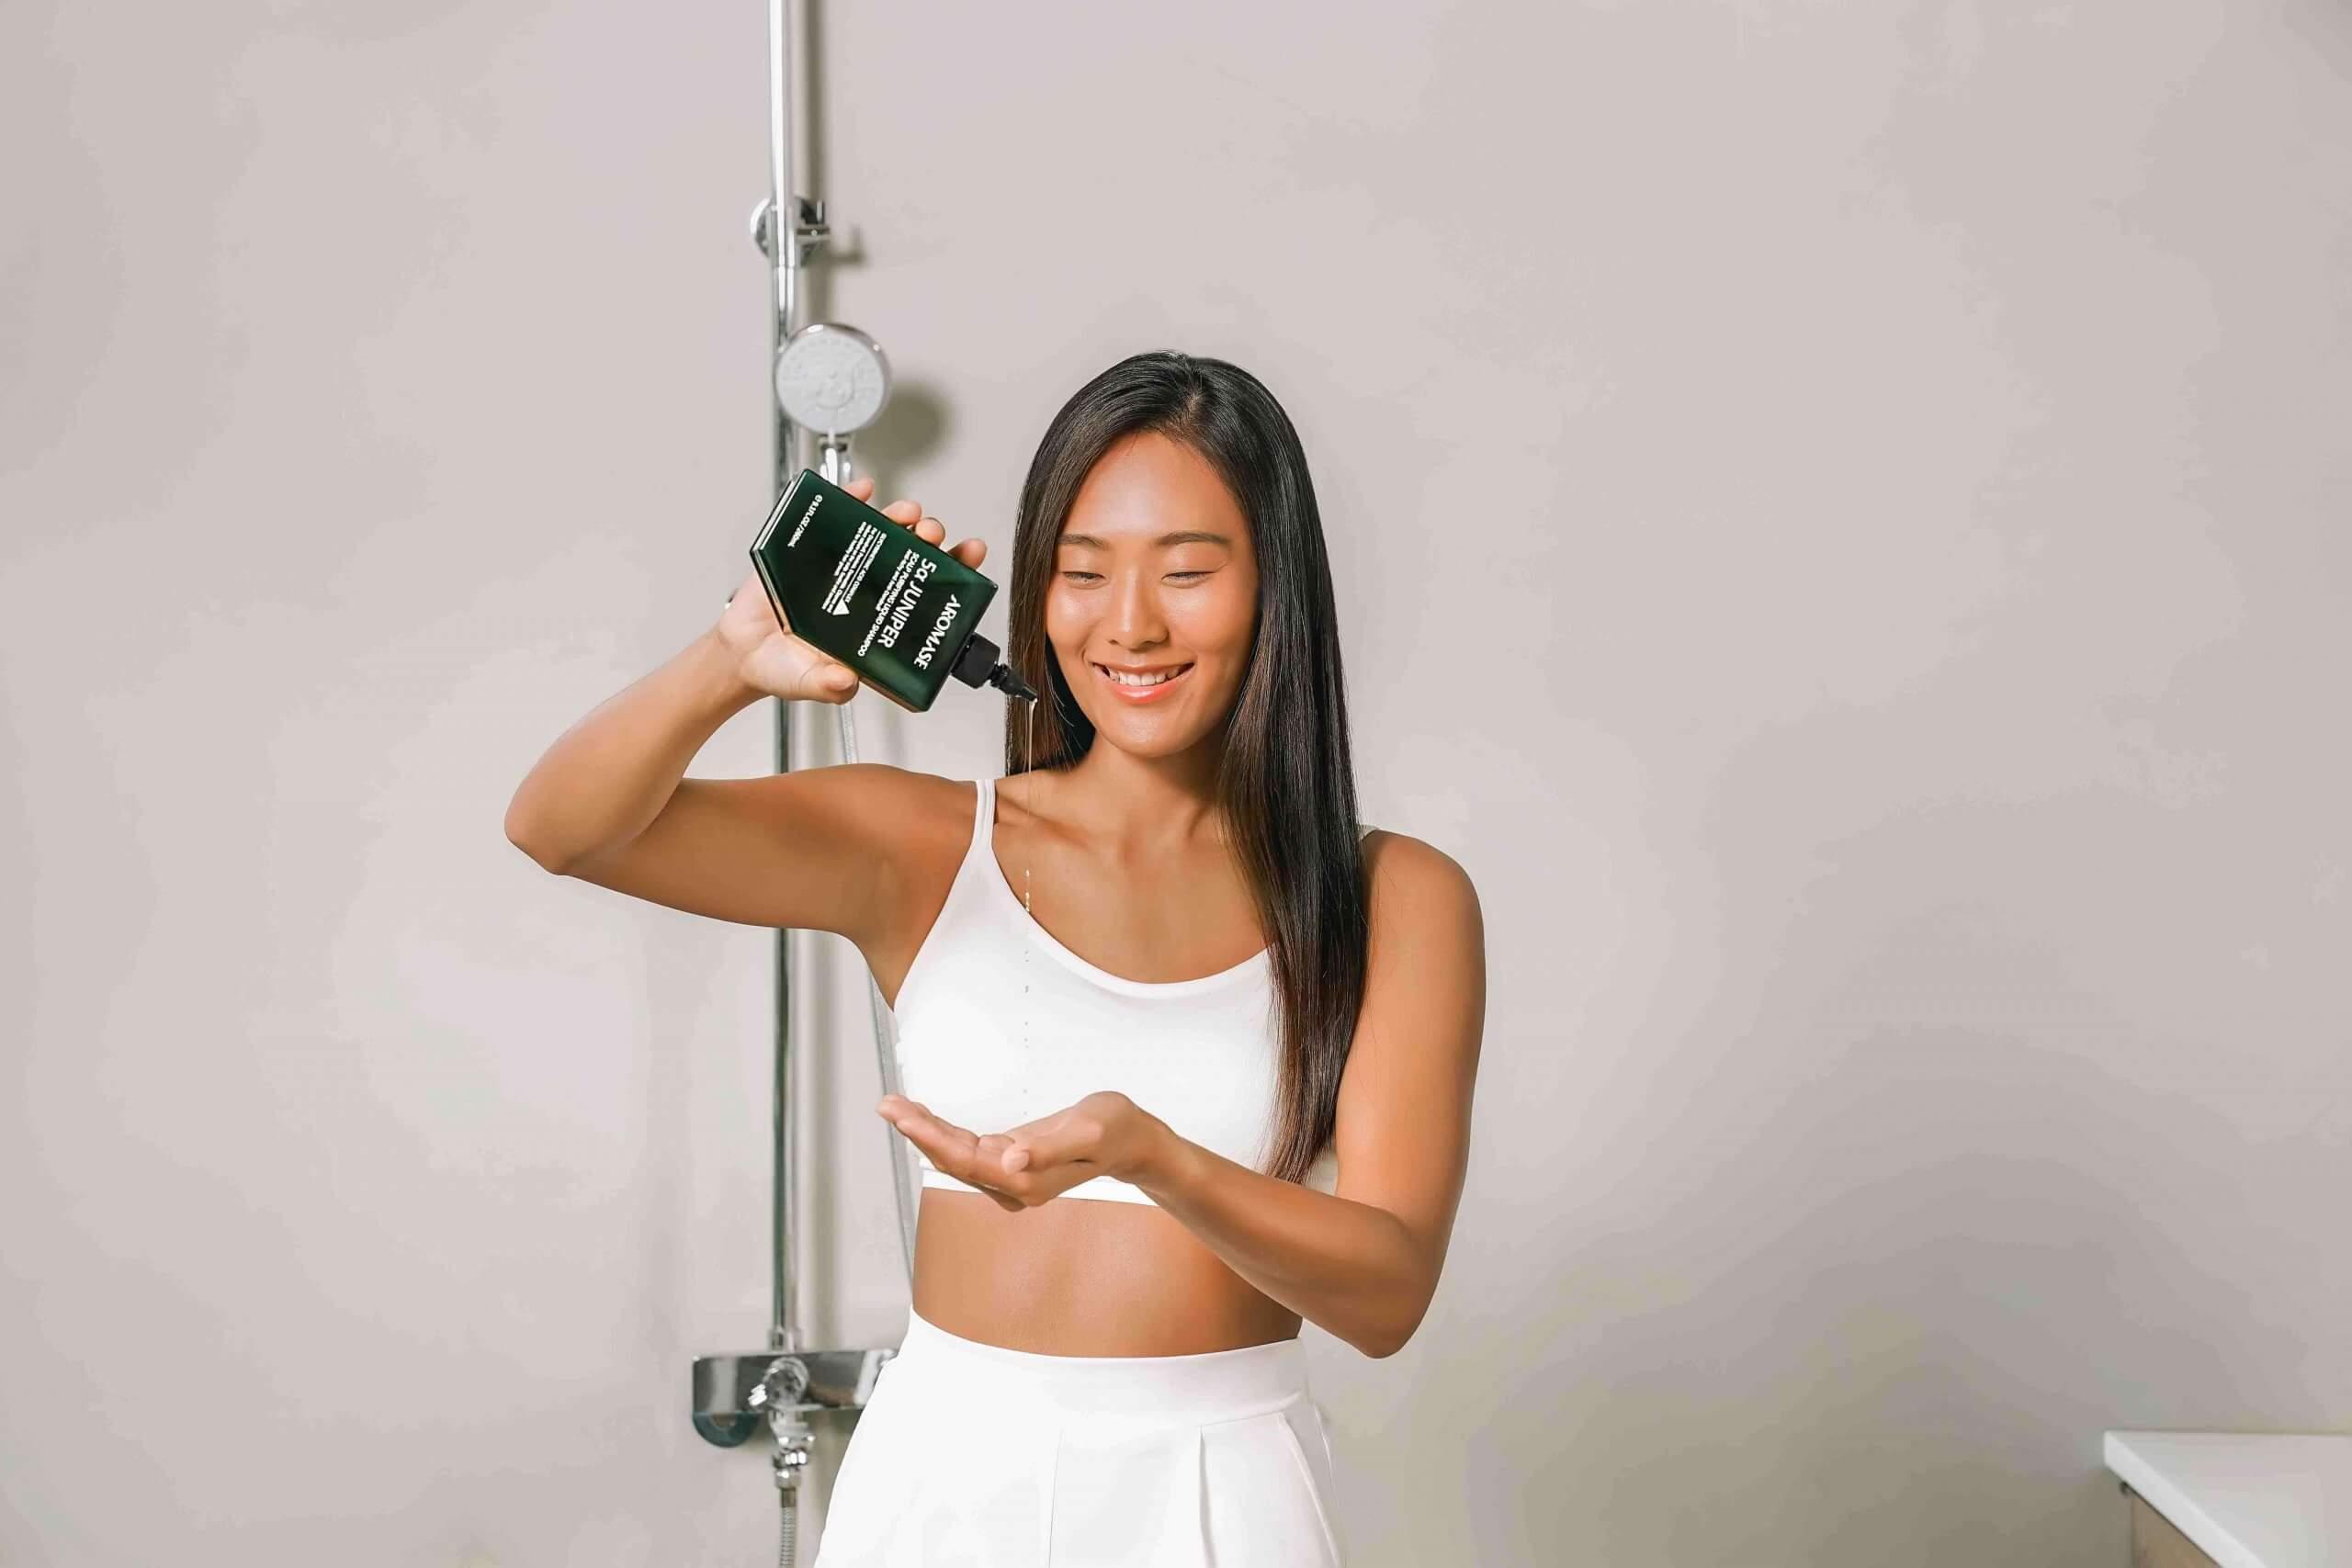 AROMASE-shampoo-shower room (1)